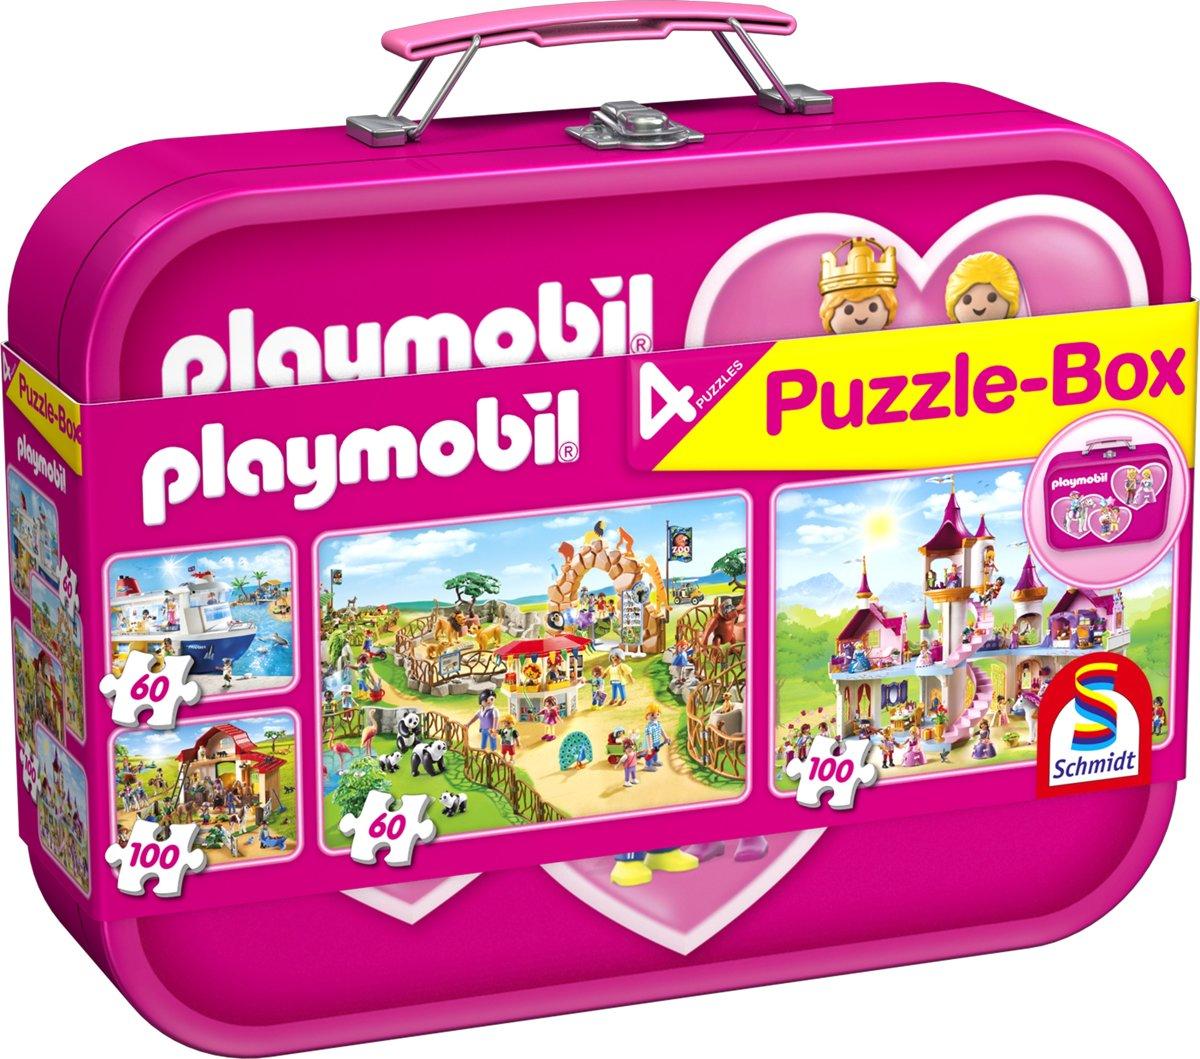 Playmobil, Puzzle-Box rose, 2x60, 2x100 stukjes Puzzel